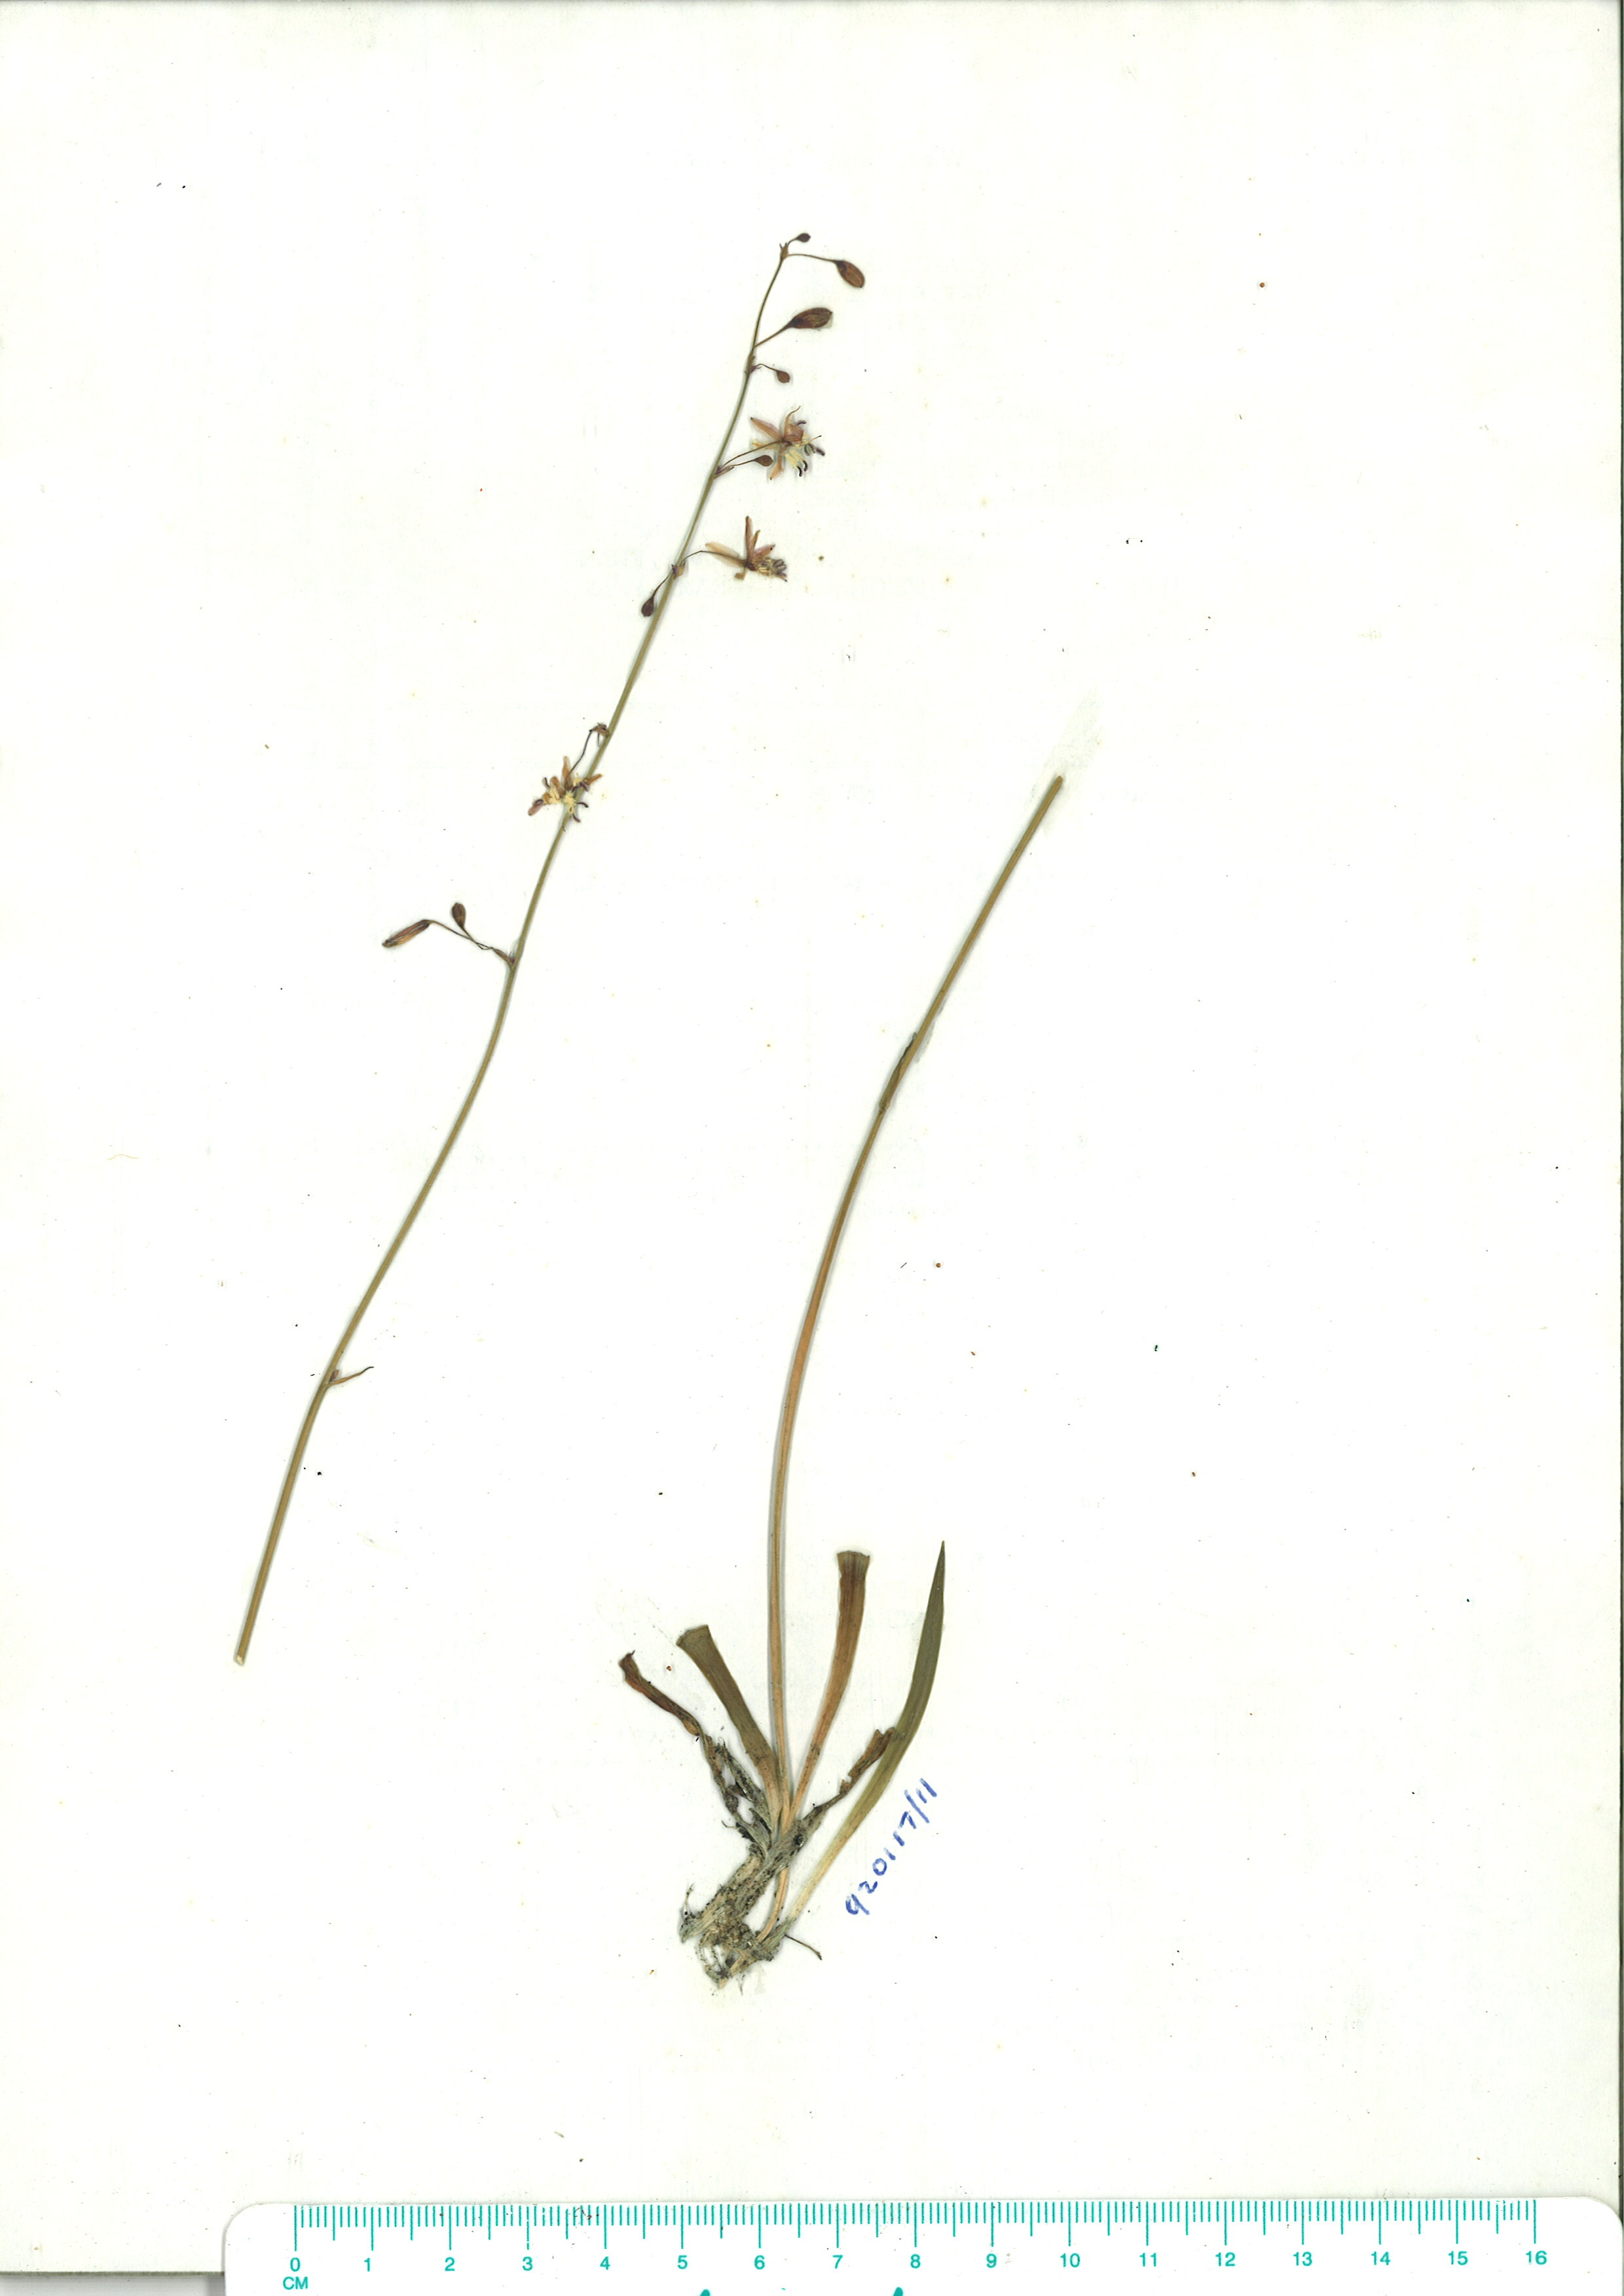 Scanned image of herbarium image of Arthropodium milleflorum